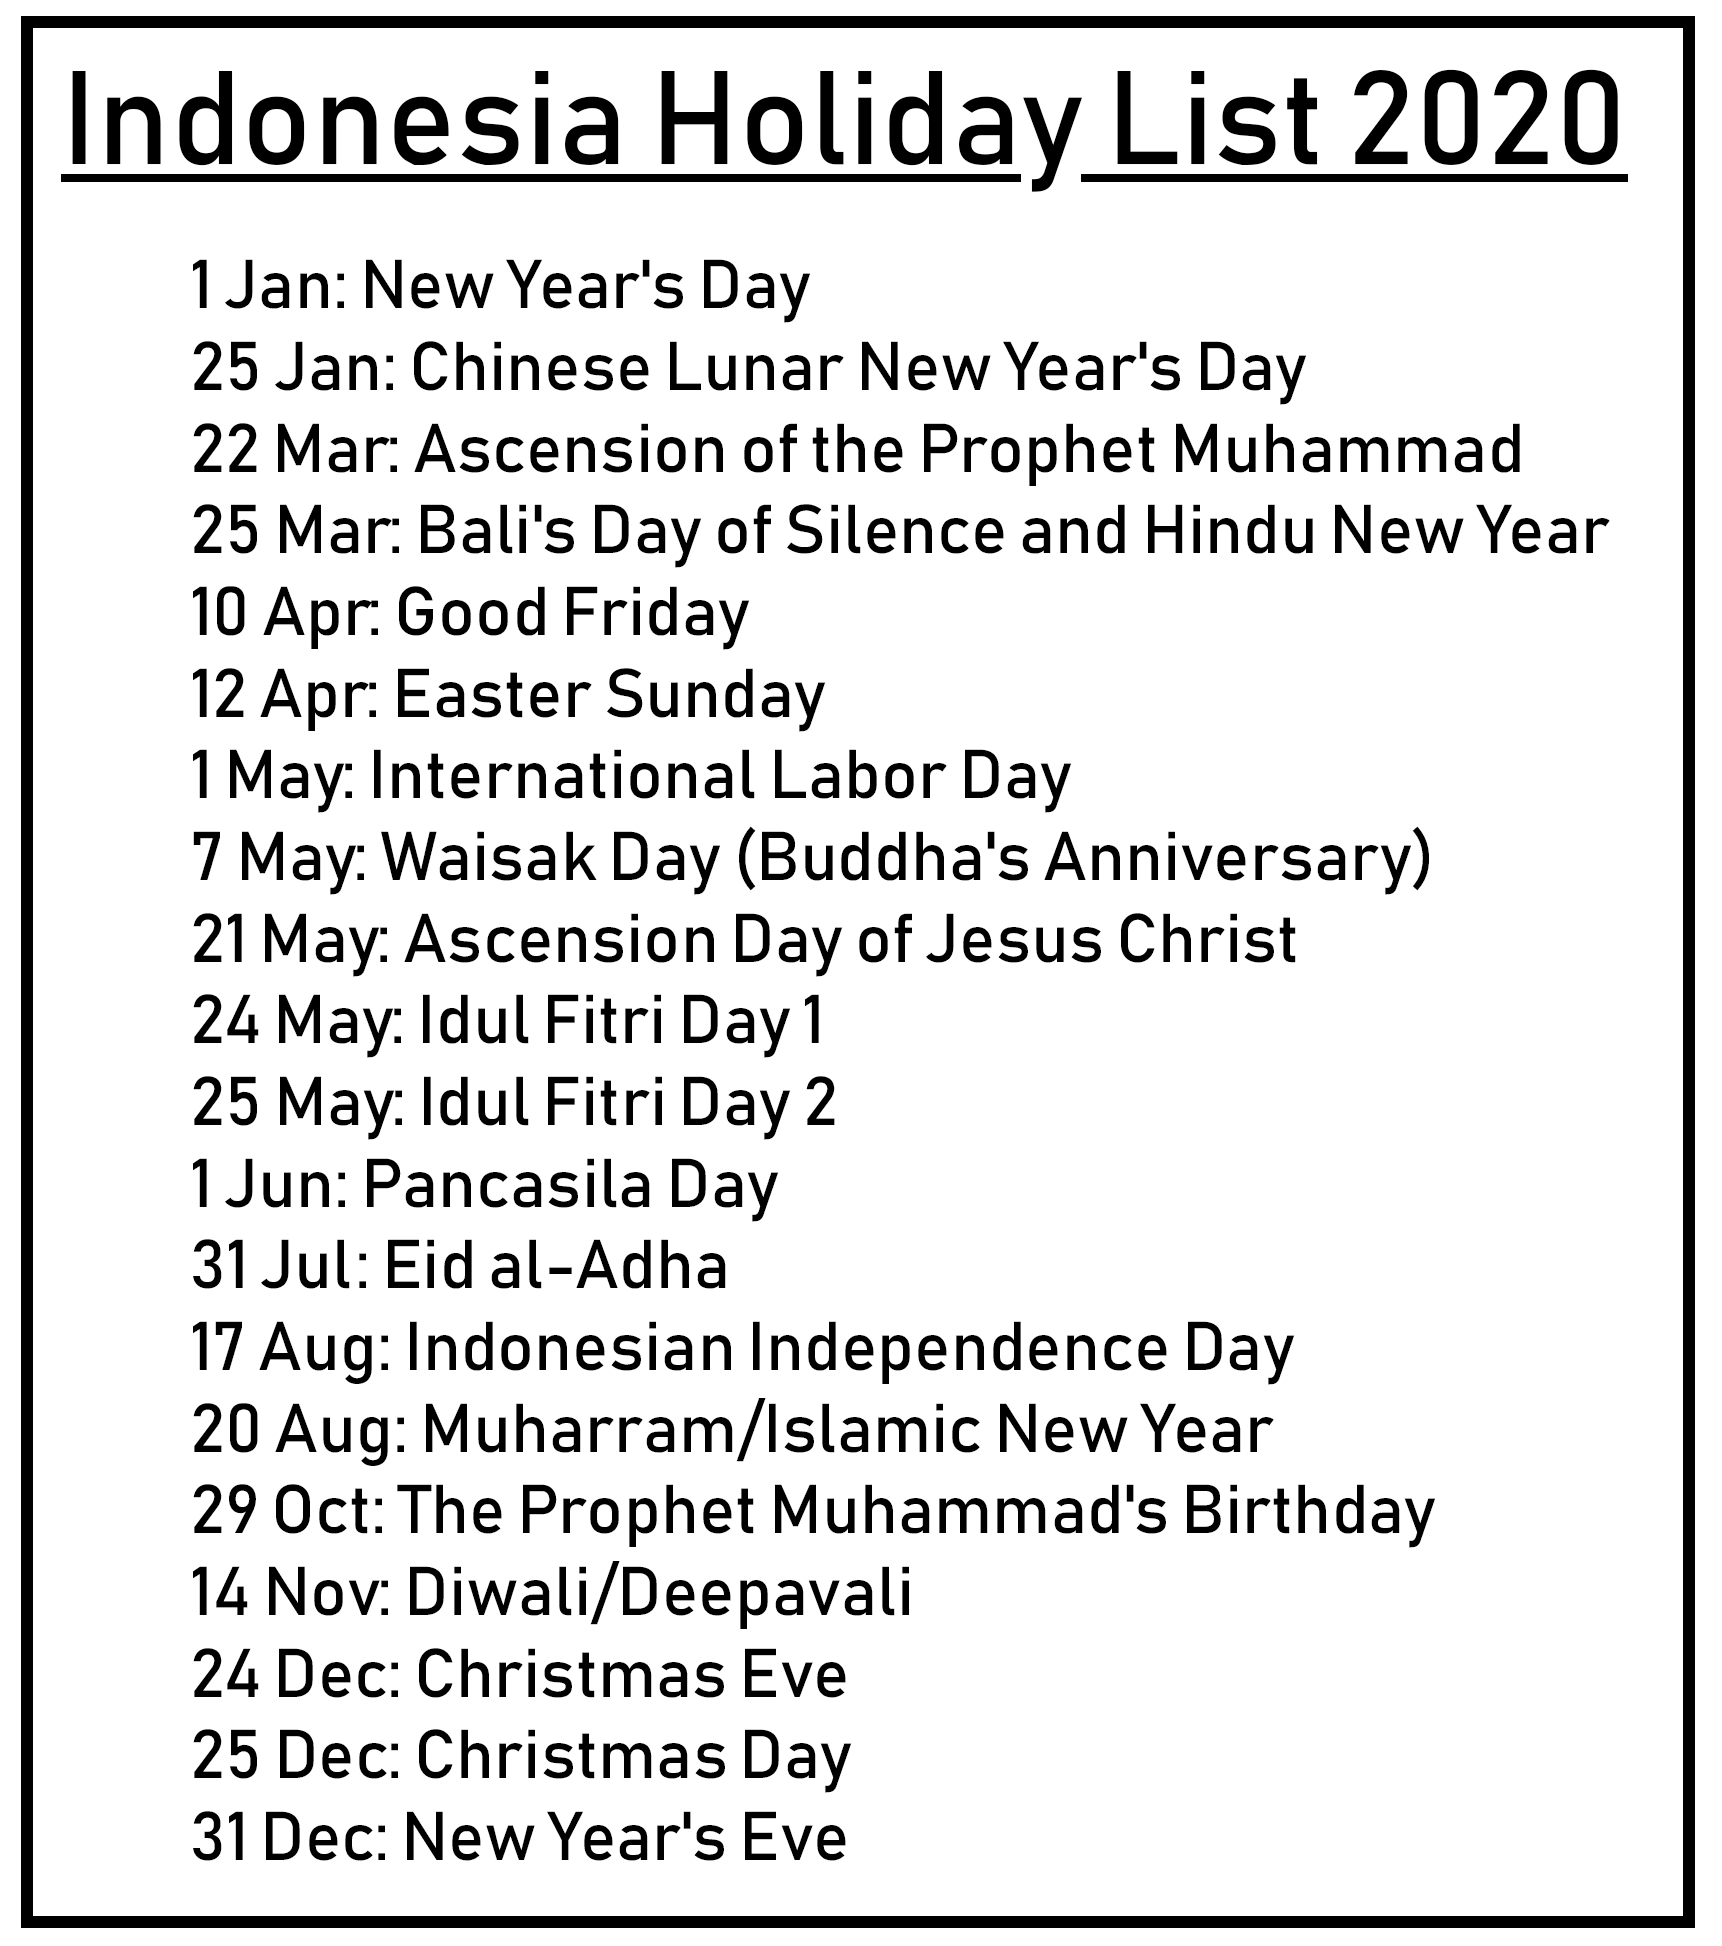 Printable Calendar 2020 With Indonesia Holidays | Printable-2020 List Of Holidays Printable